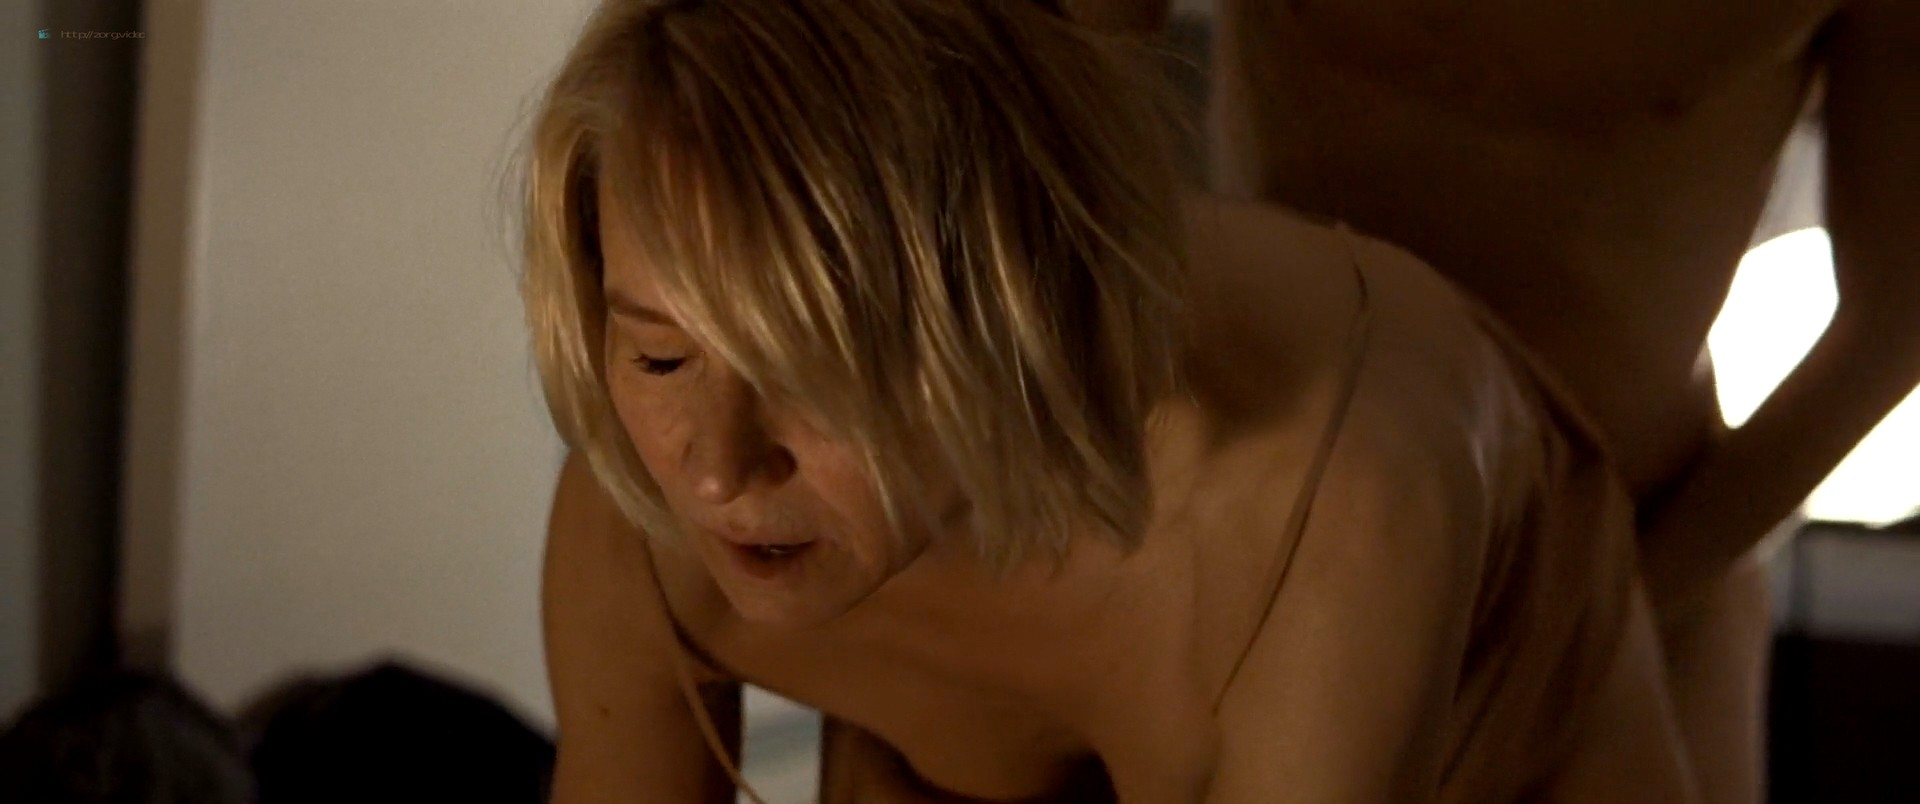 Trine Dyrholm nude explicit blow job and hot sex - Queen of Hearts (DK-2019) 1080p WEB (9)